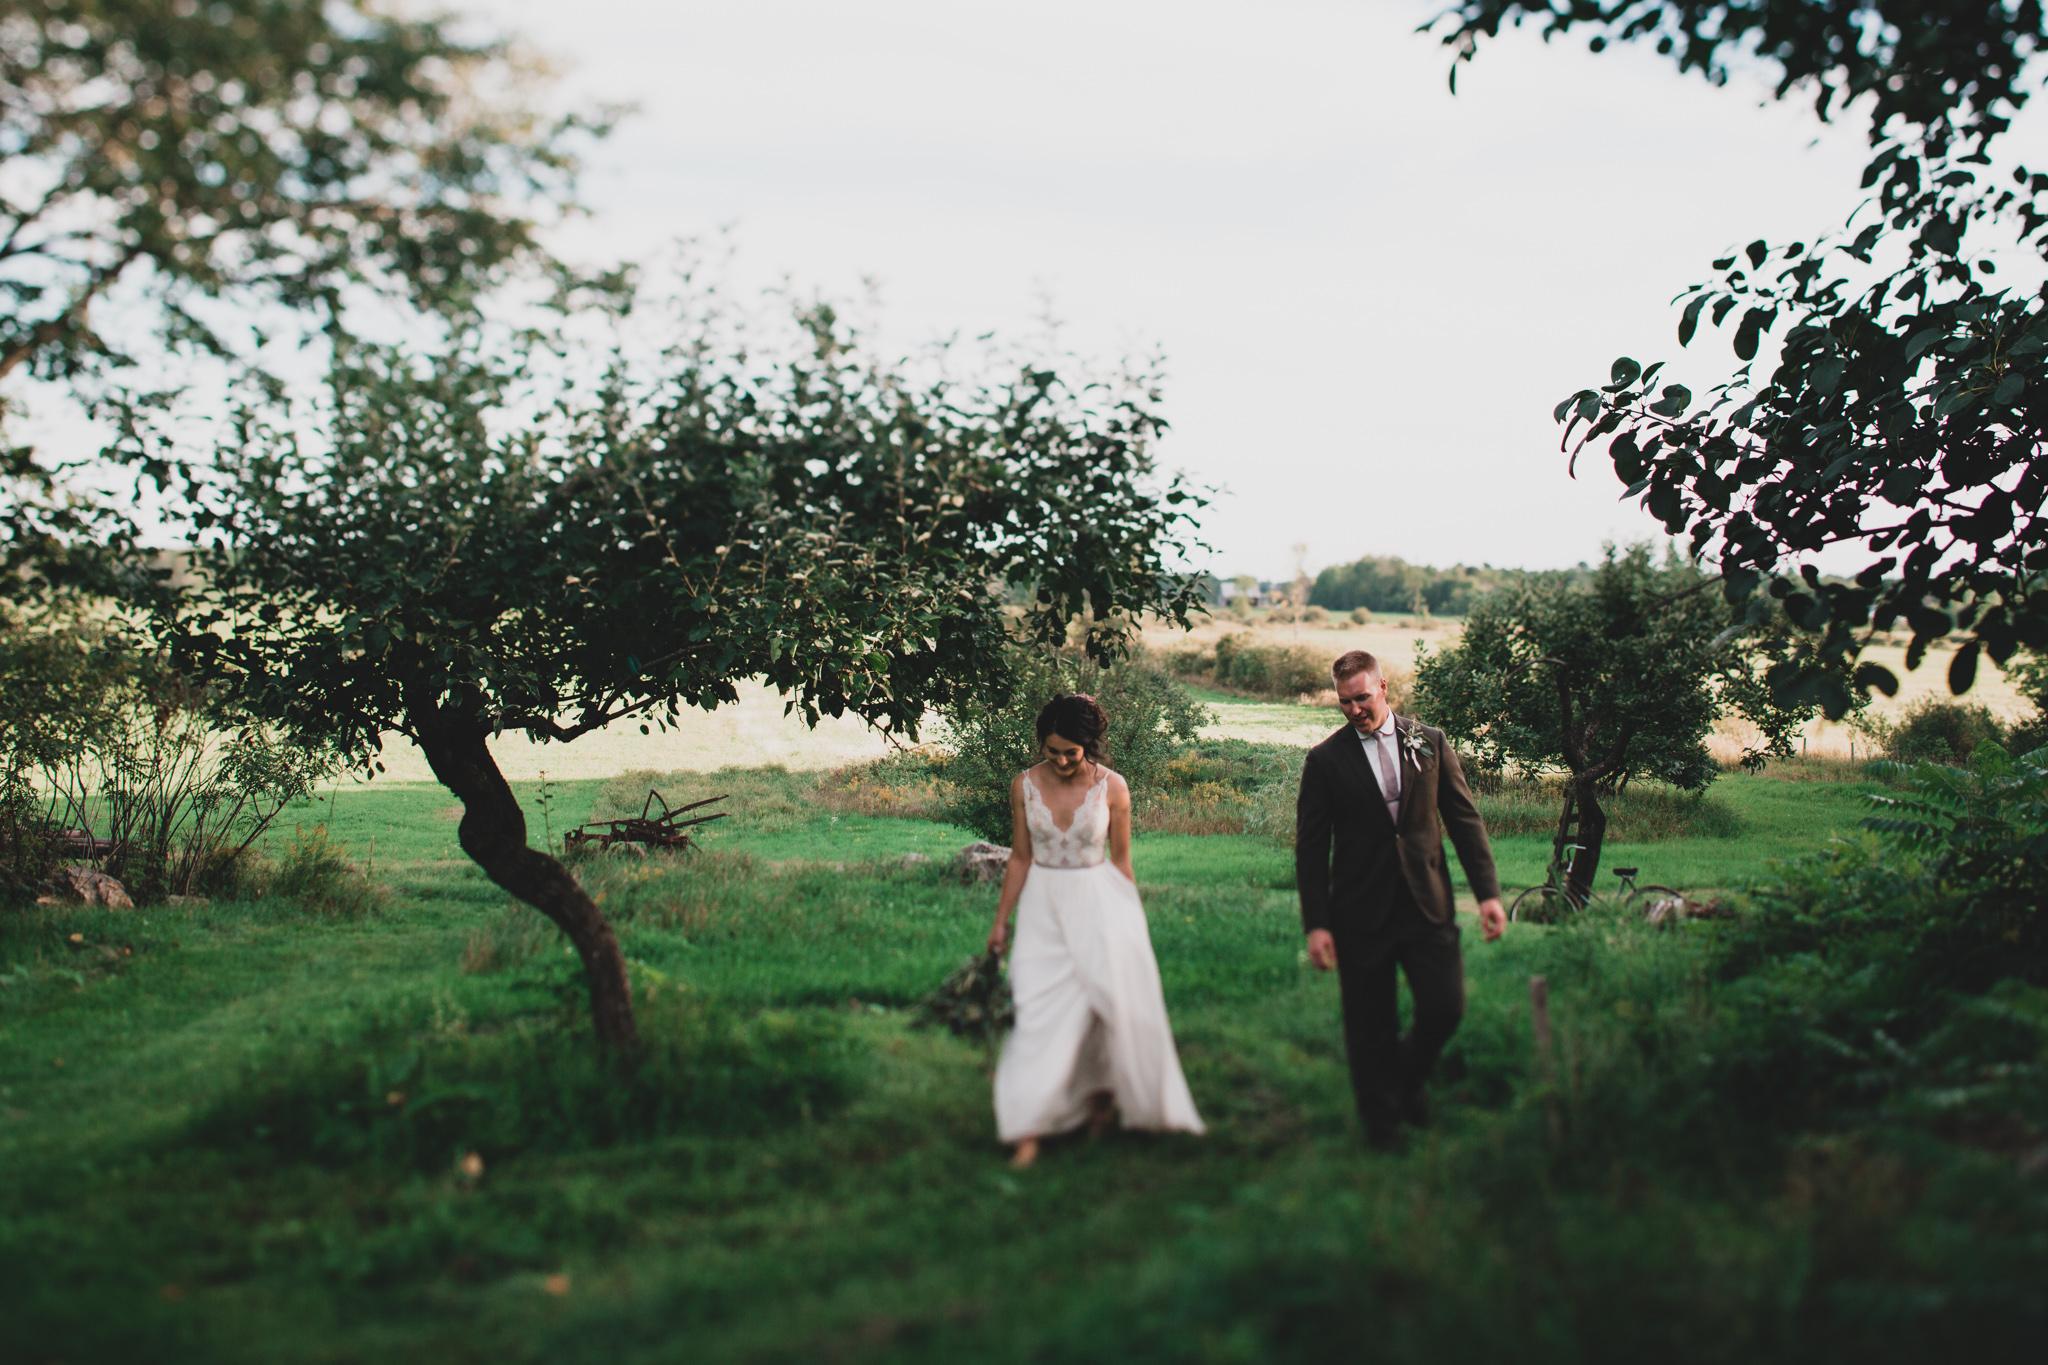 Val des Monts Wedding Venue, Rustic